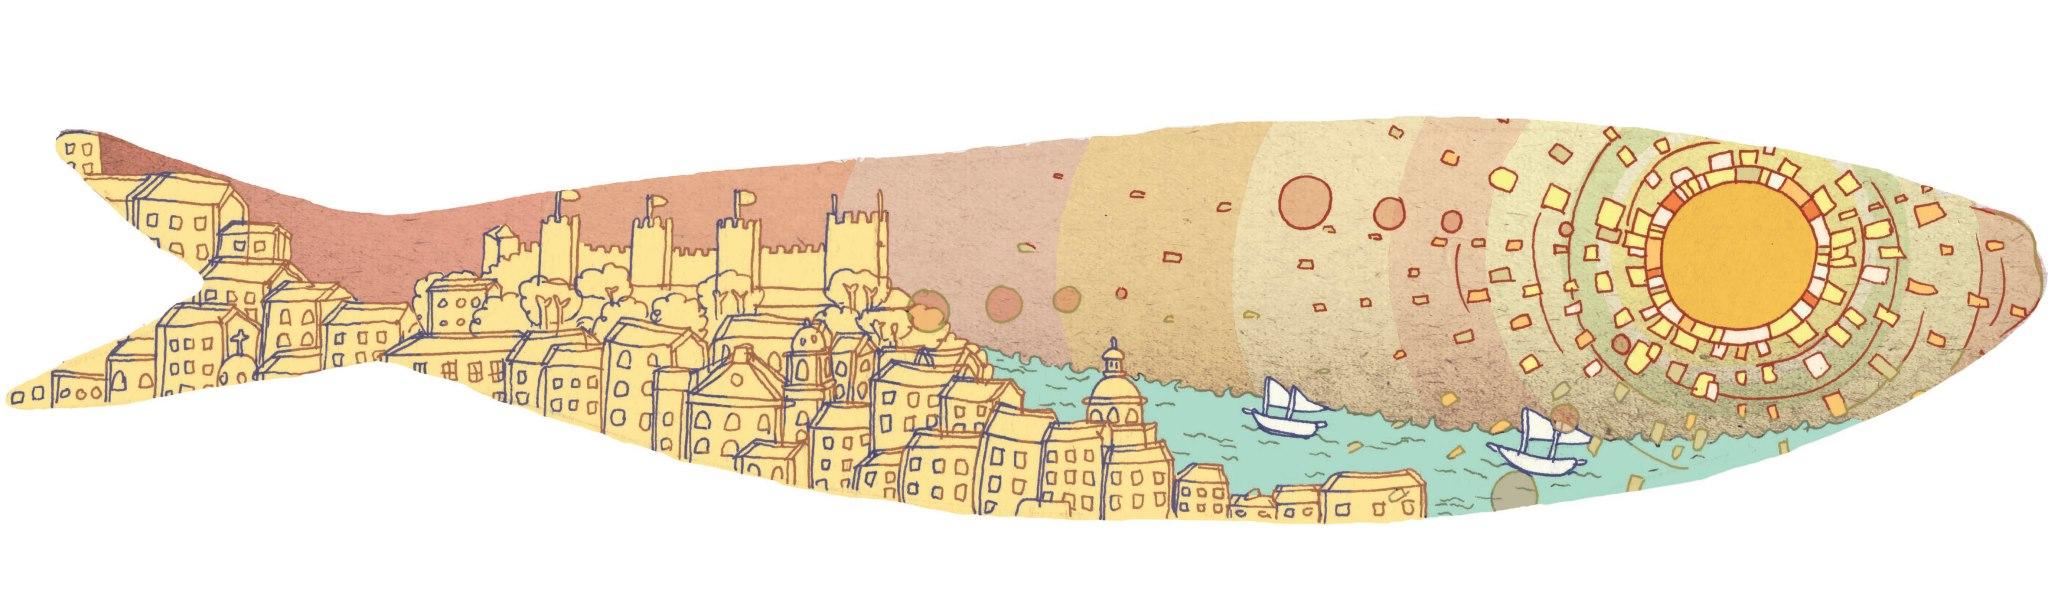 Lisbon in a Sardine, Ink and Digital, 2014